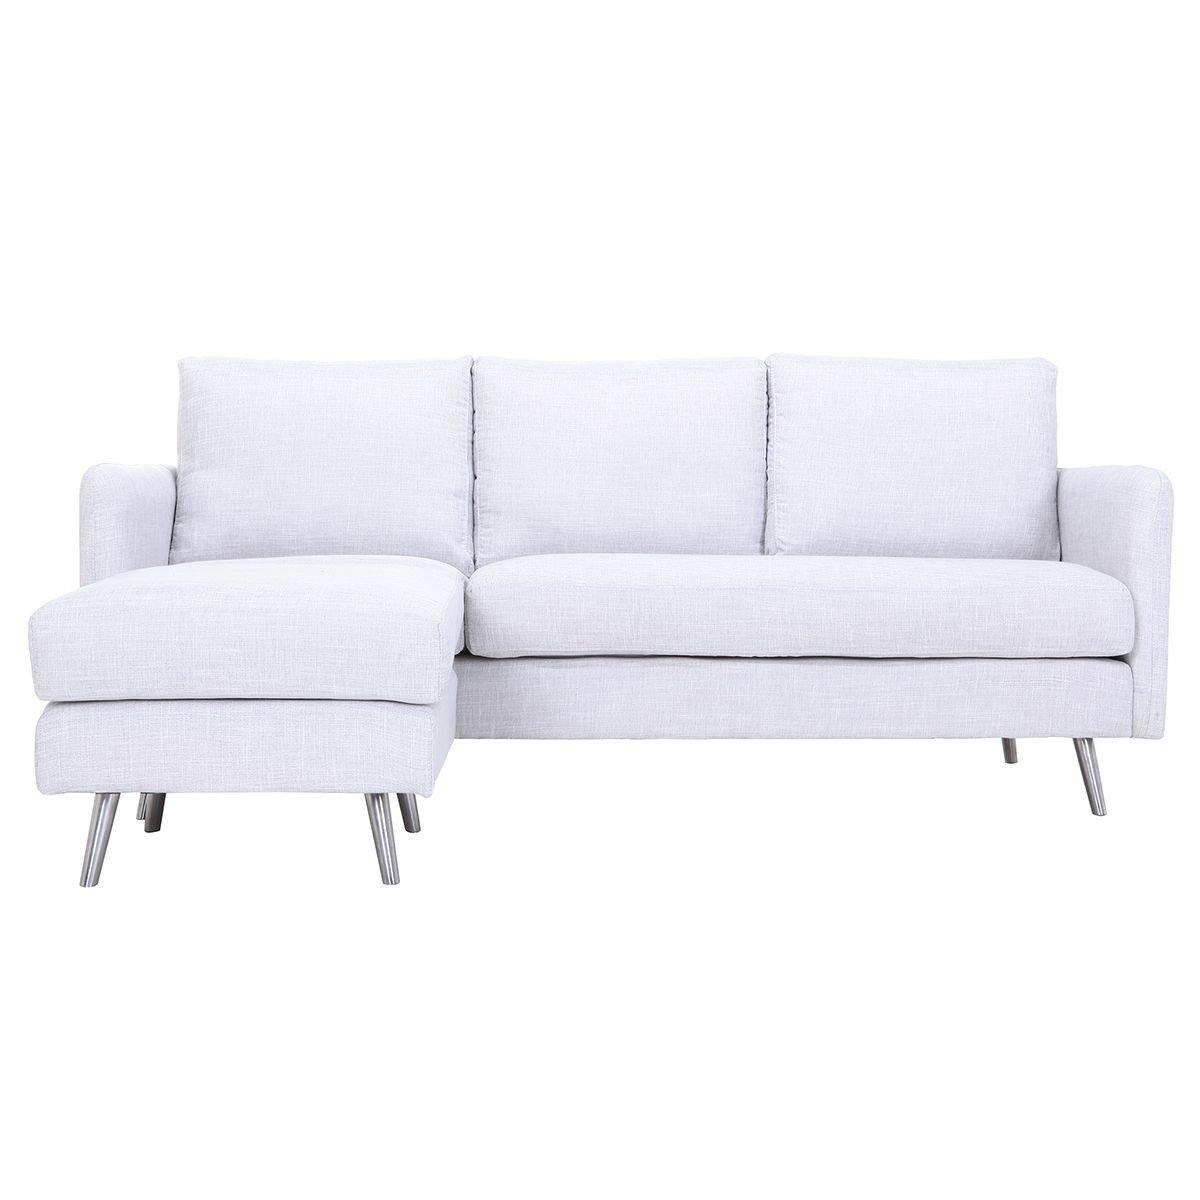 Miliboo - Sofá de Esquina Reversible diseño 3 plazas Gris ...